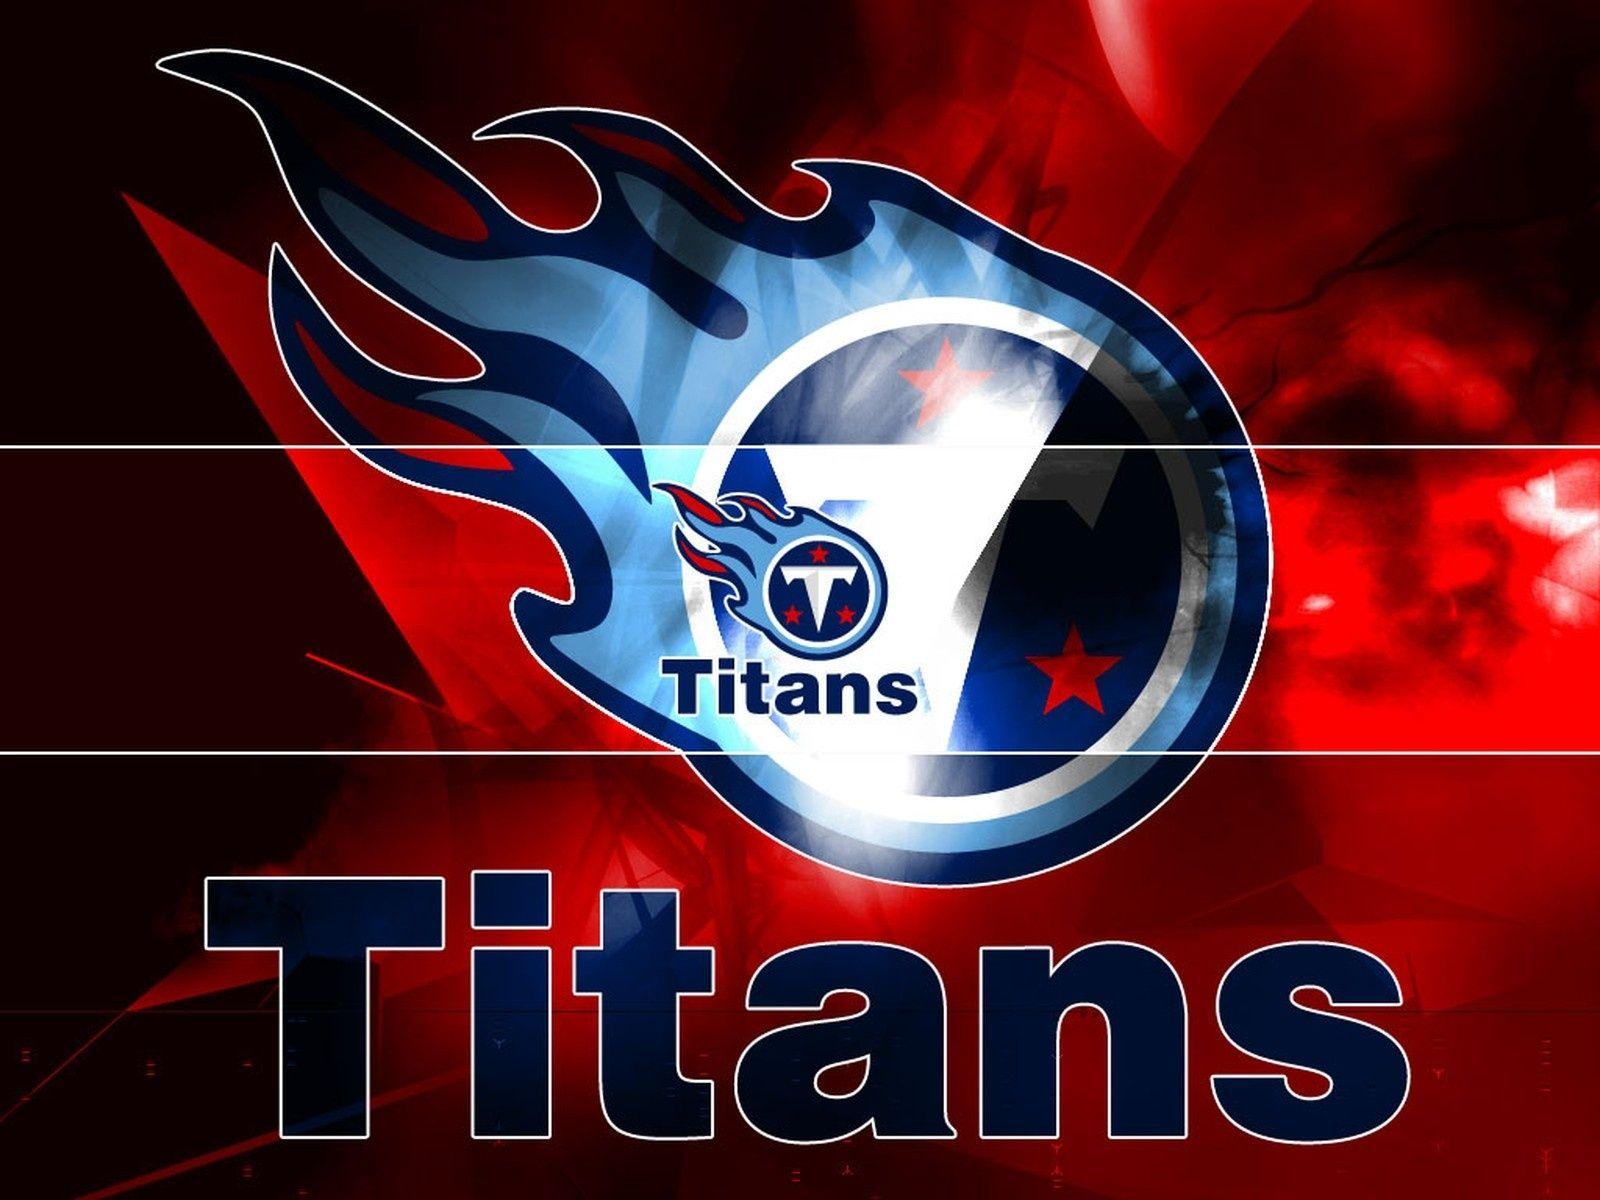 Tennessee Titans Wallpaper Tennessee Titans Wallpapers In 1600x1200 Resolution Tennessee Titans Titans Titans Football